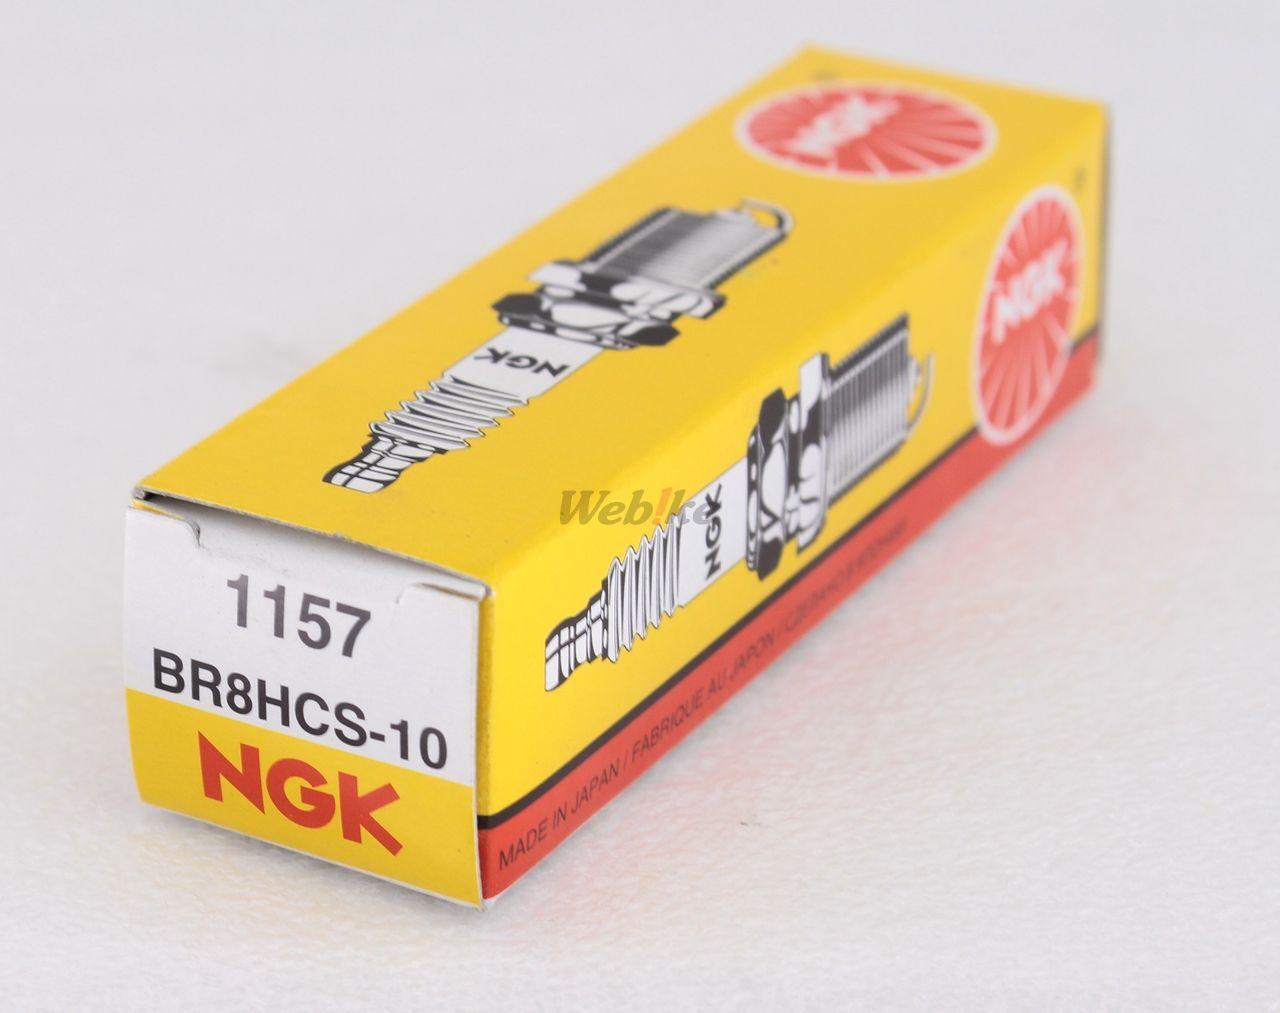 【NGK】標準型 火星塞 BR8HCS-10 1157 - 「Webike-摩托百貨」